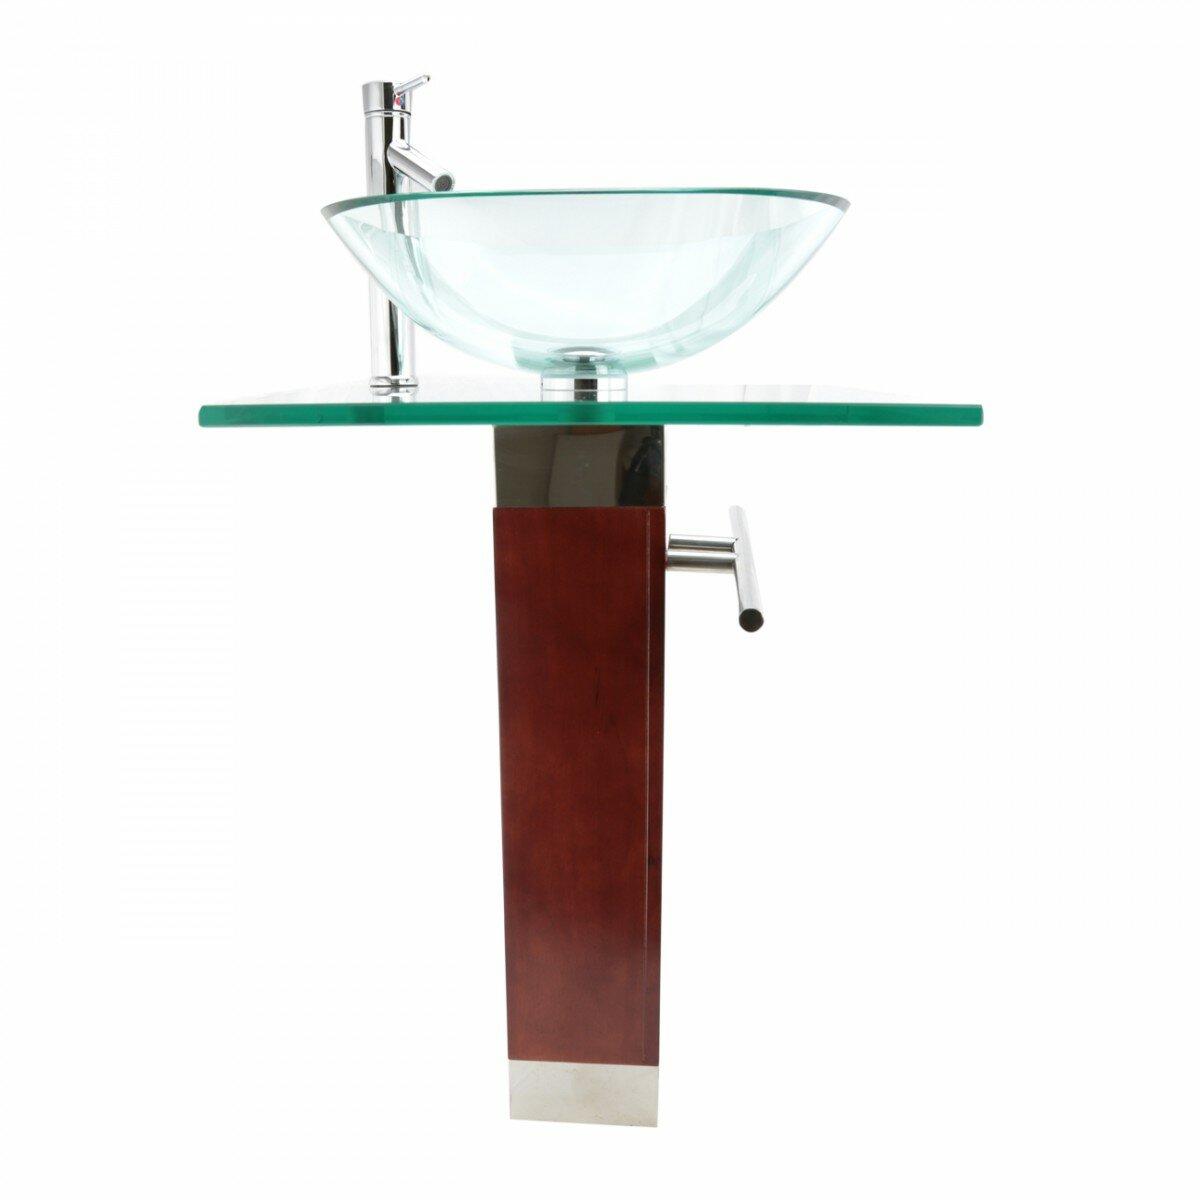 bohemia glass 24 pedestal bathroom sink with faucet